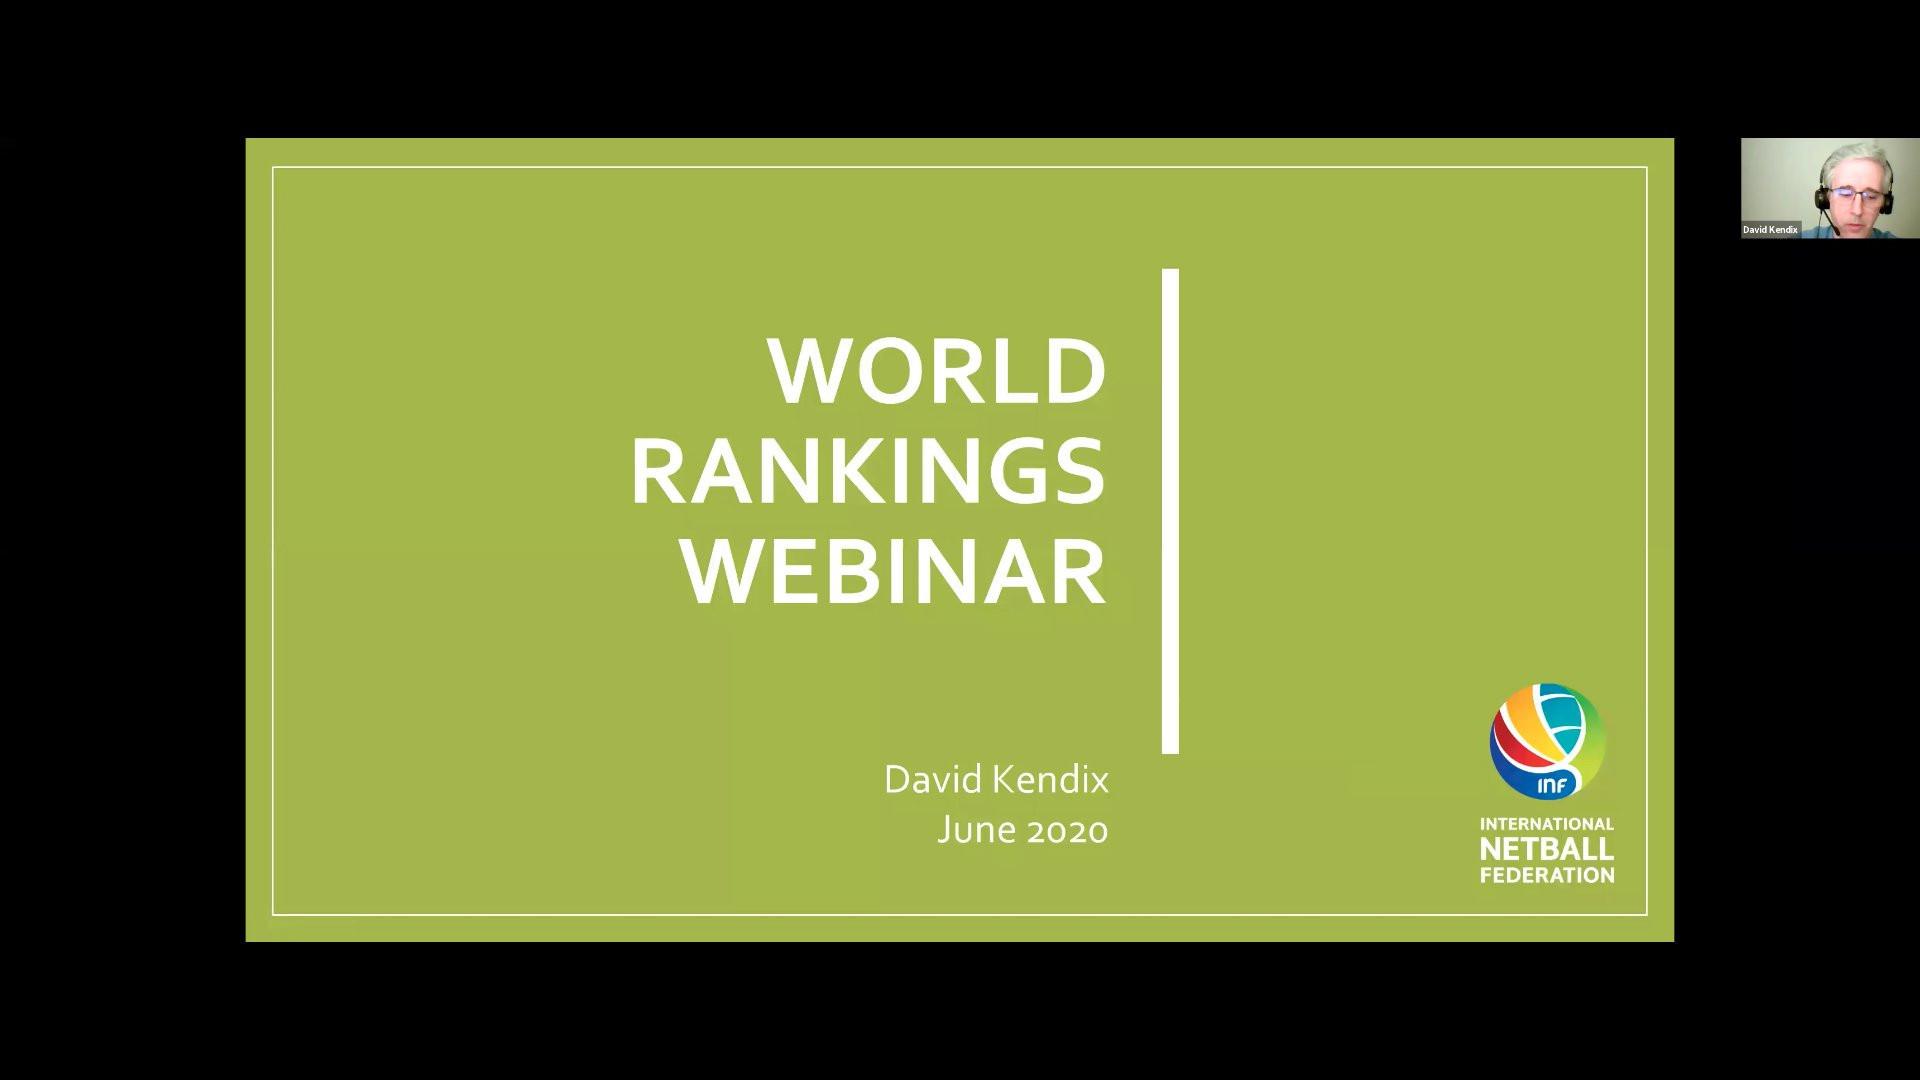 International Netball Federation host world ranking webinar